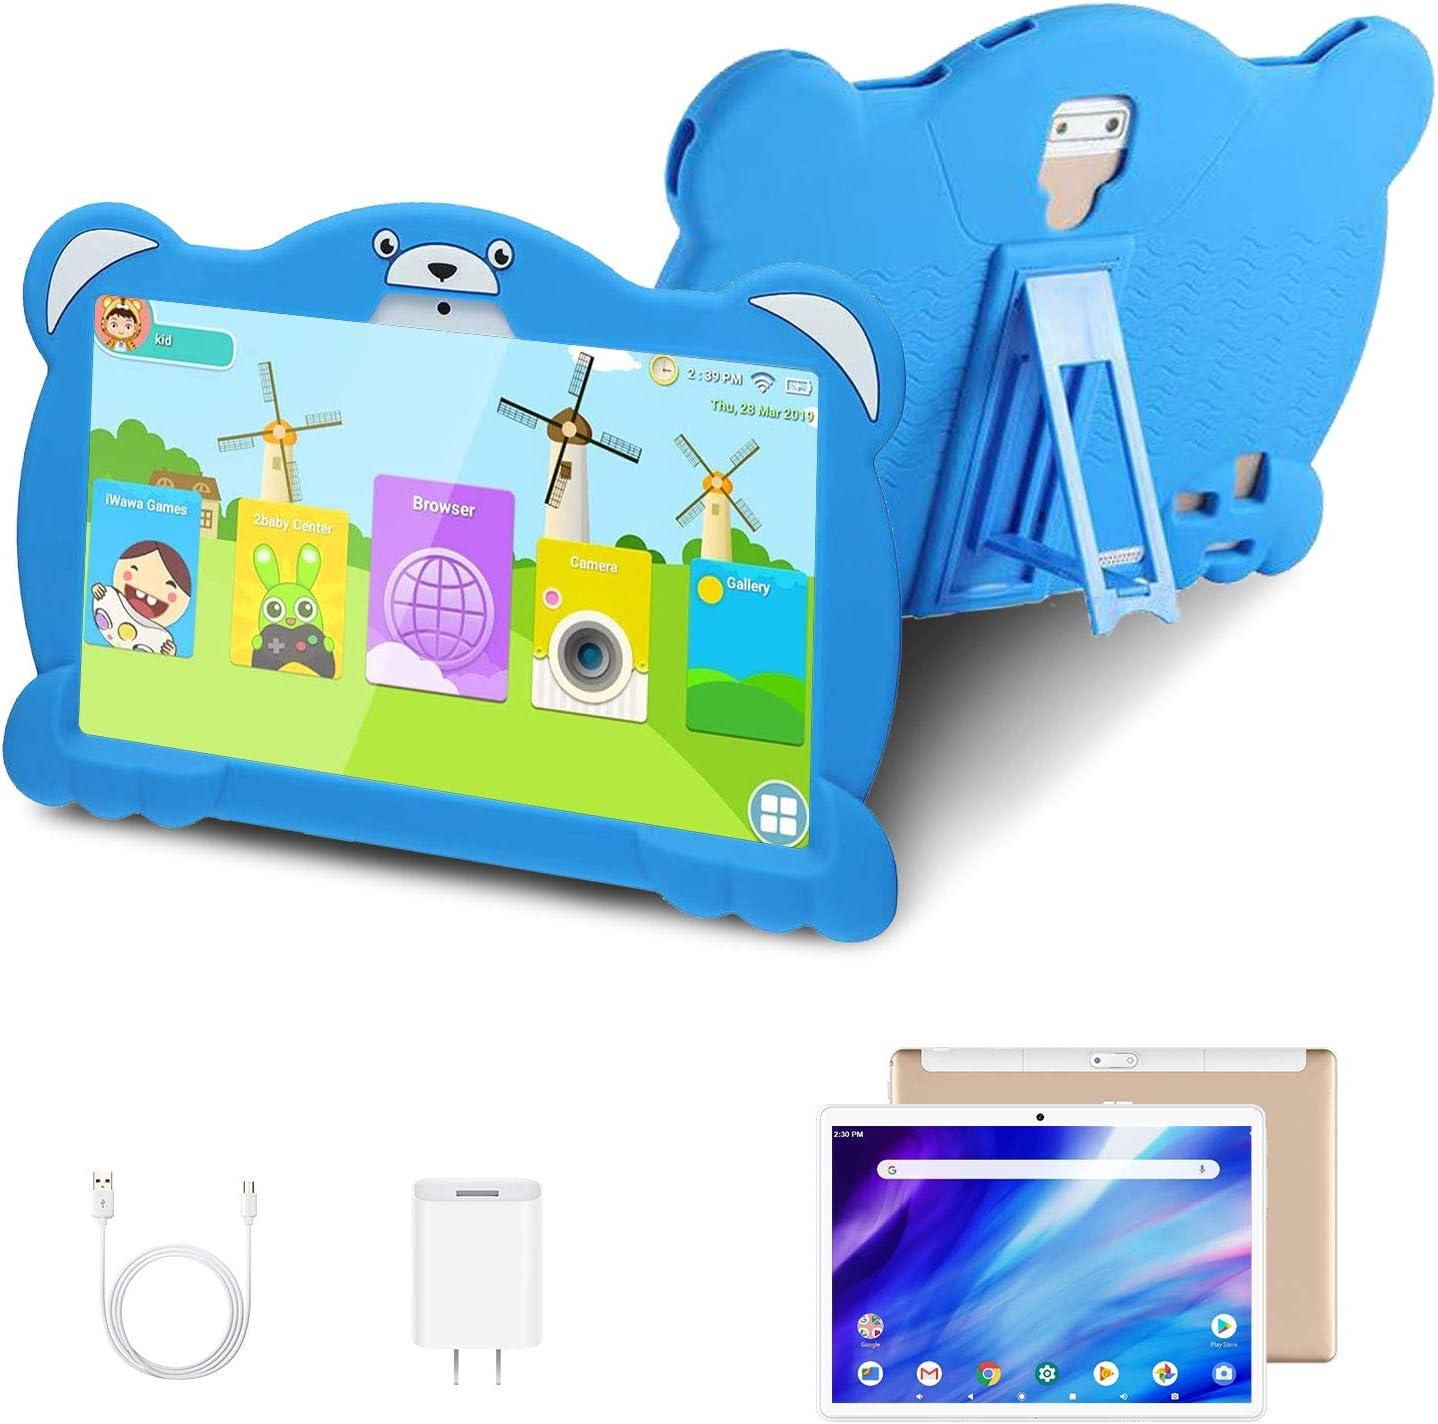 4G Tablet 10.1 Pulgadas Android 10.0 Quad Core Google GMS, DUODUOGO G11 32GB ROM/128GB Escalables 3GB RAM Tablet PC Batería 8000mAh Double SIM/Cámara WiFi Type-C (Azul)